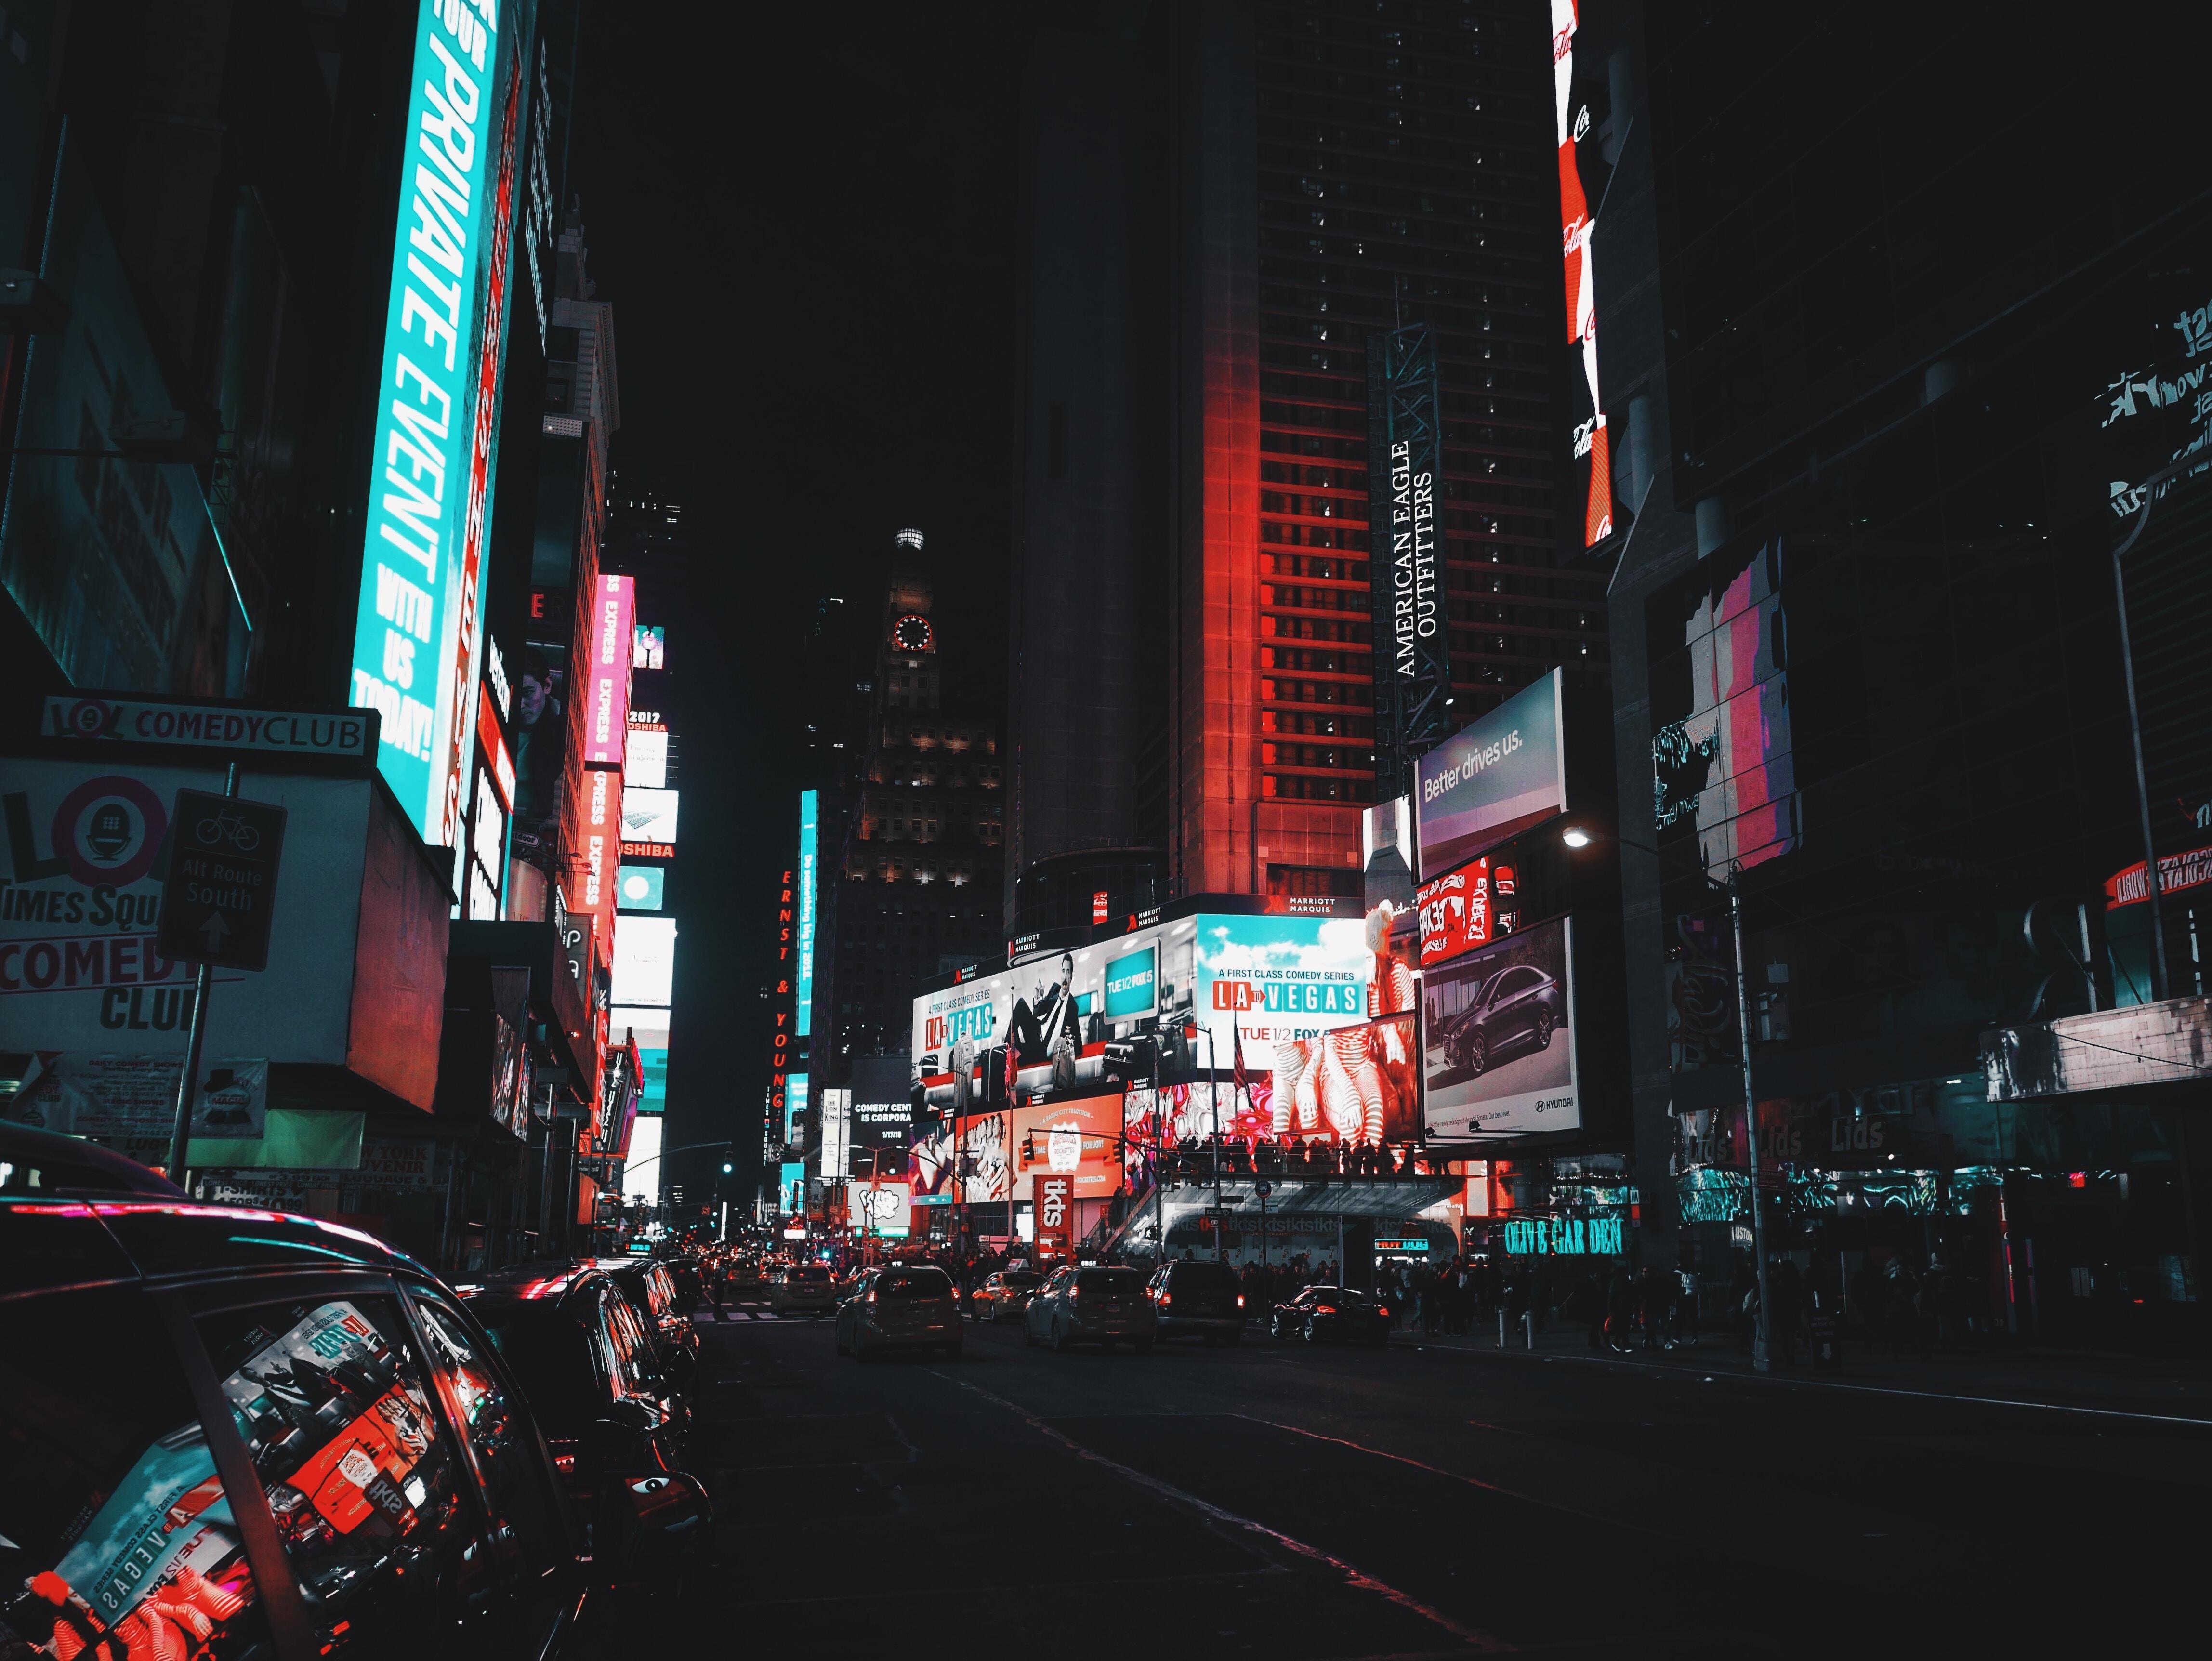 city skyline under black sky during nighttime